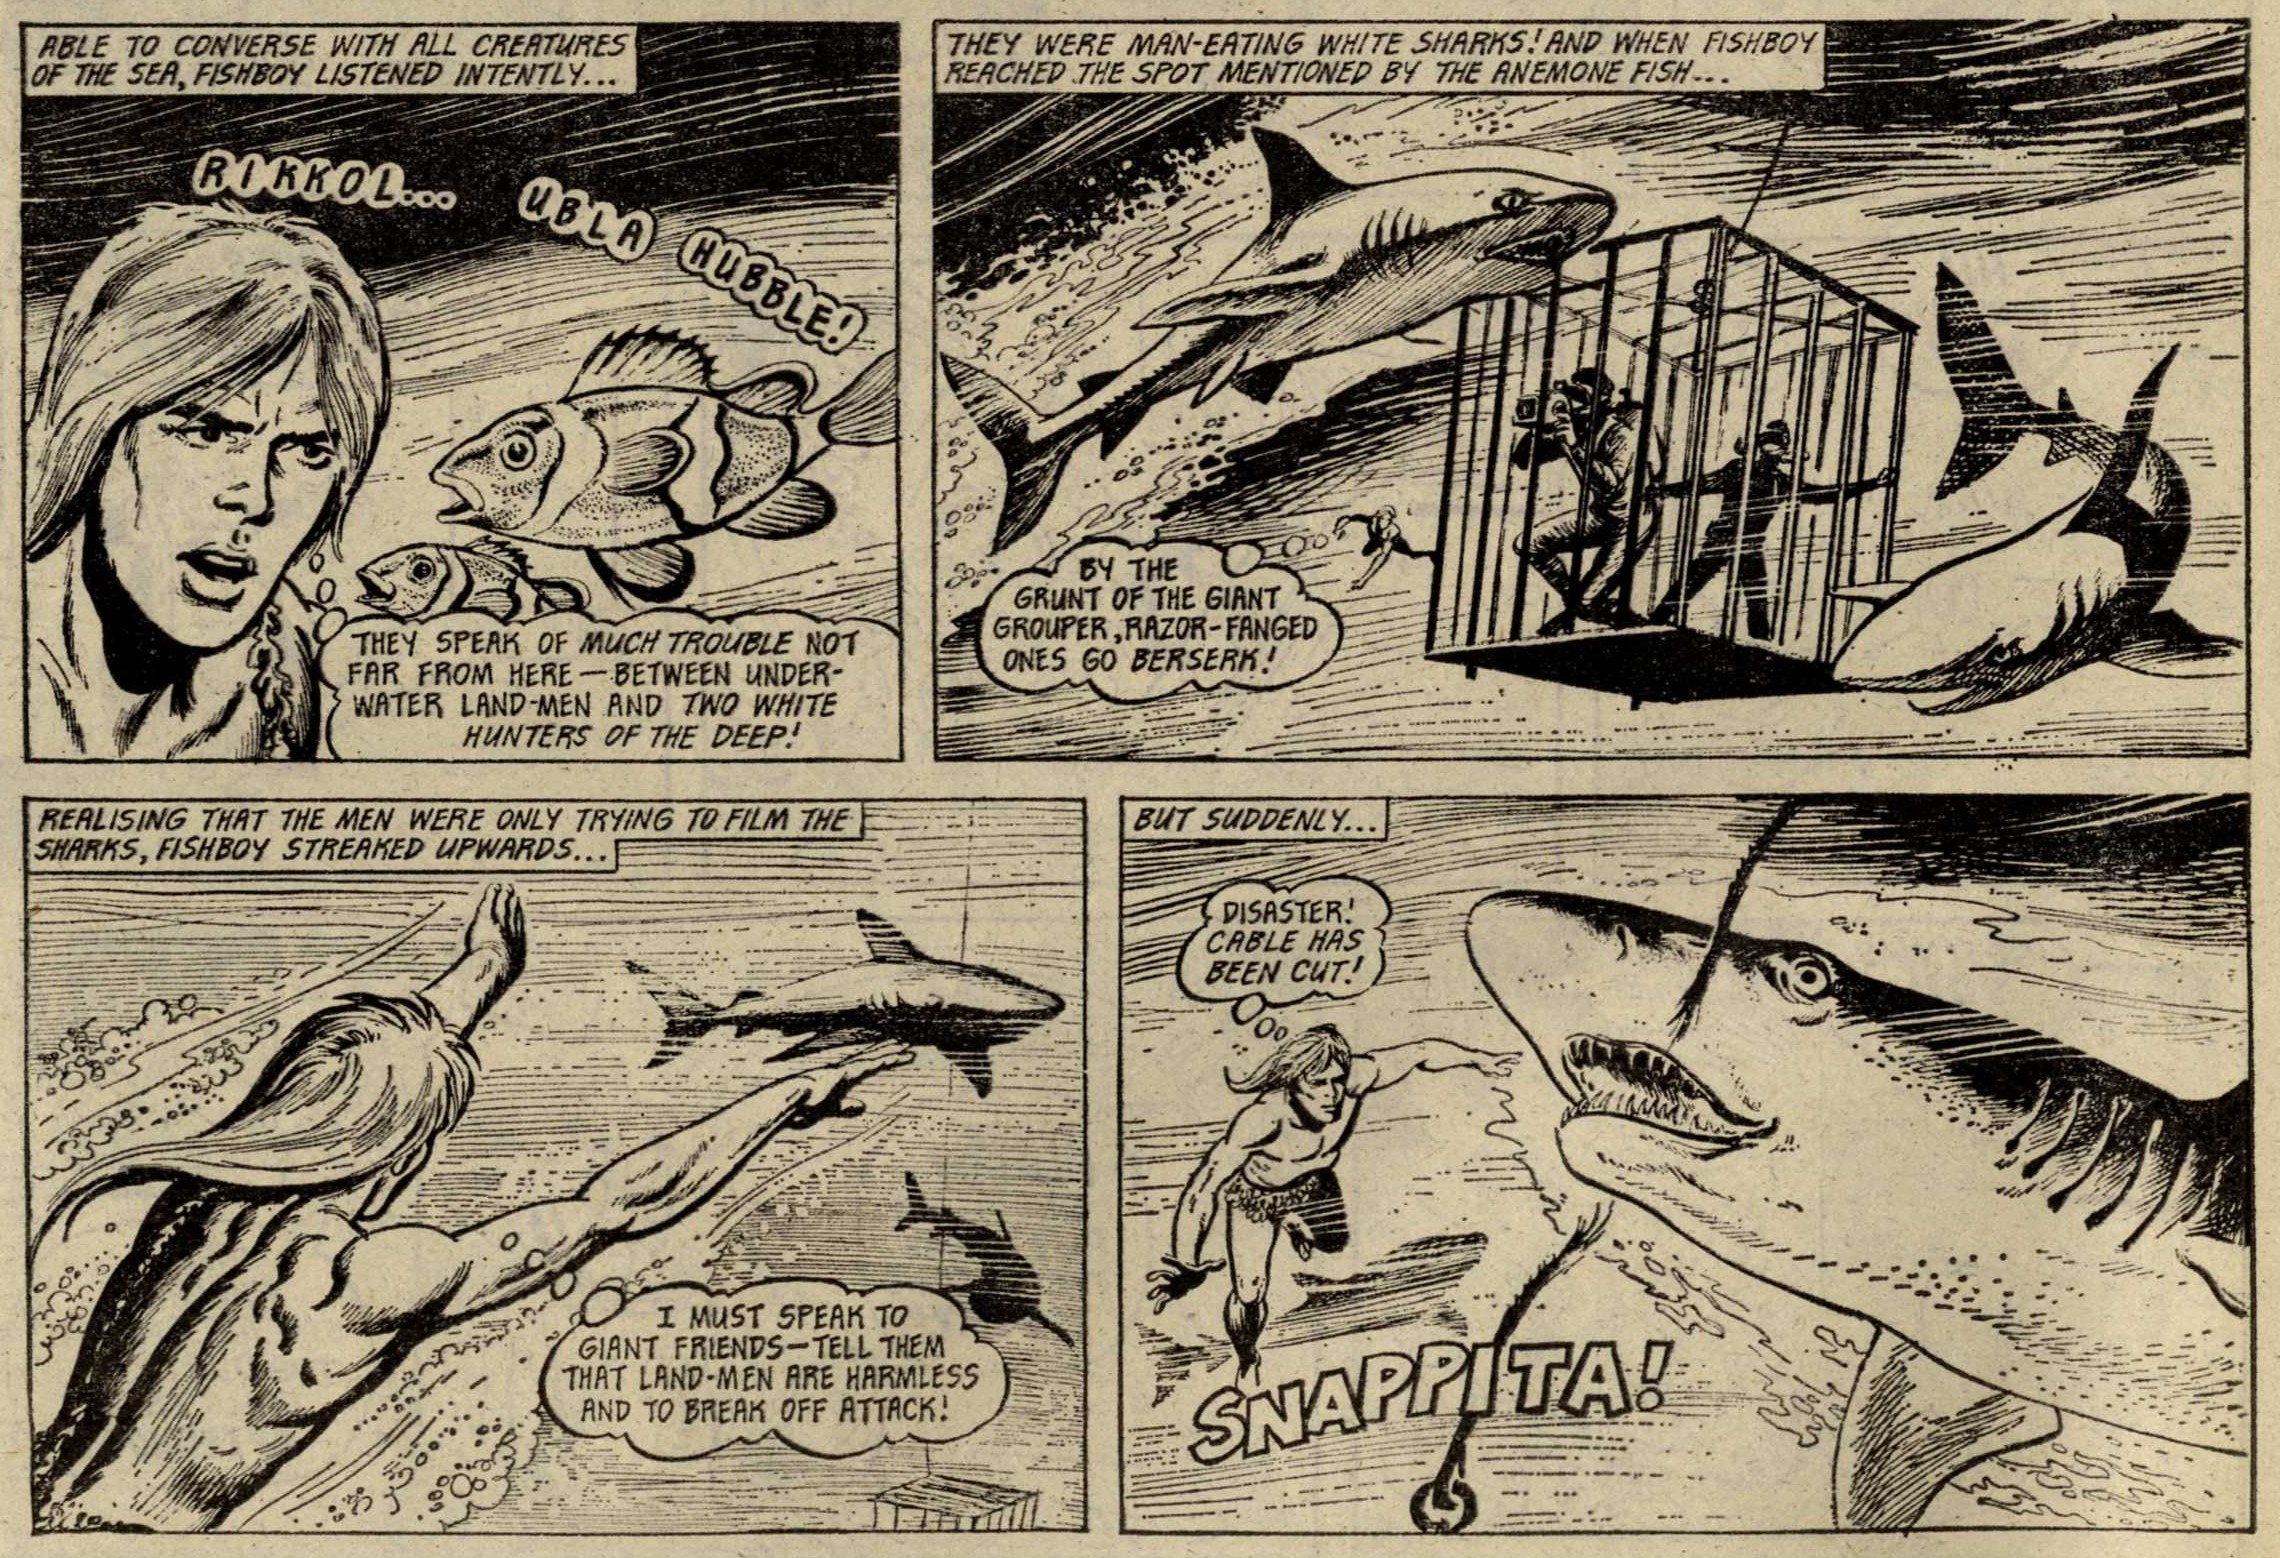 Fishboy: Scott Goodall (writer), John Stokes (artist)